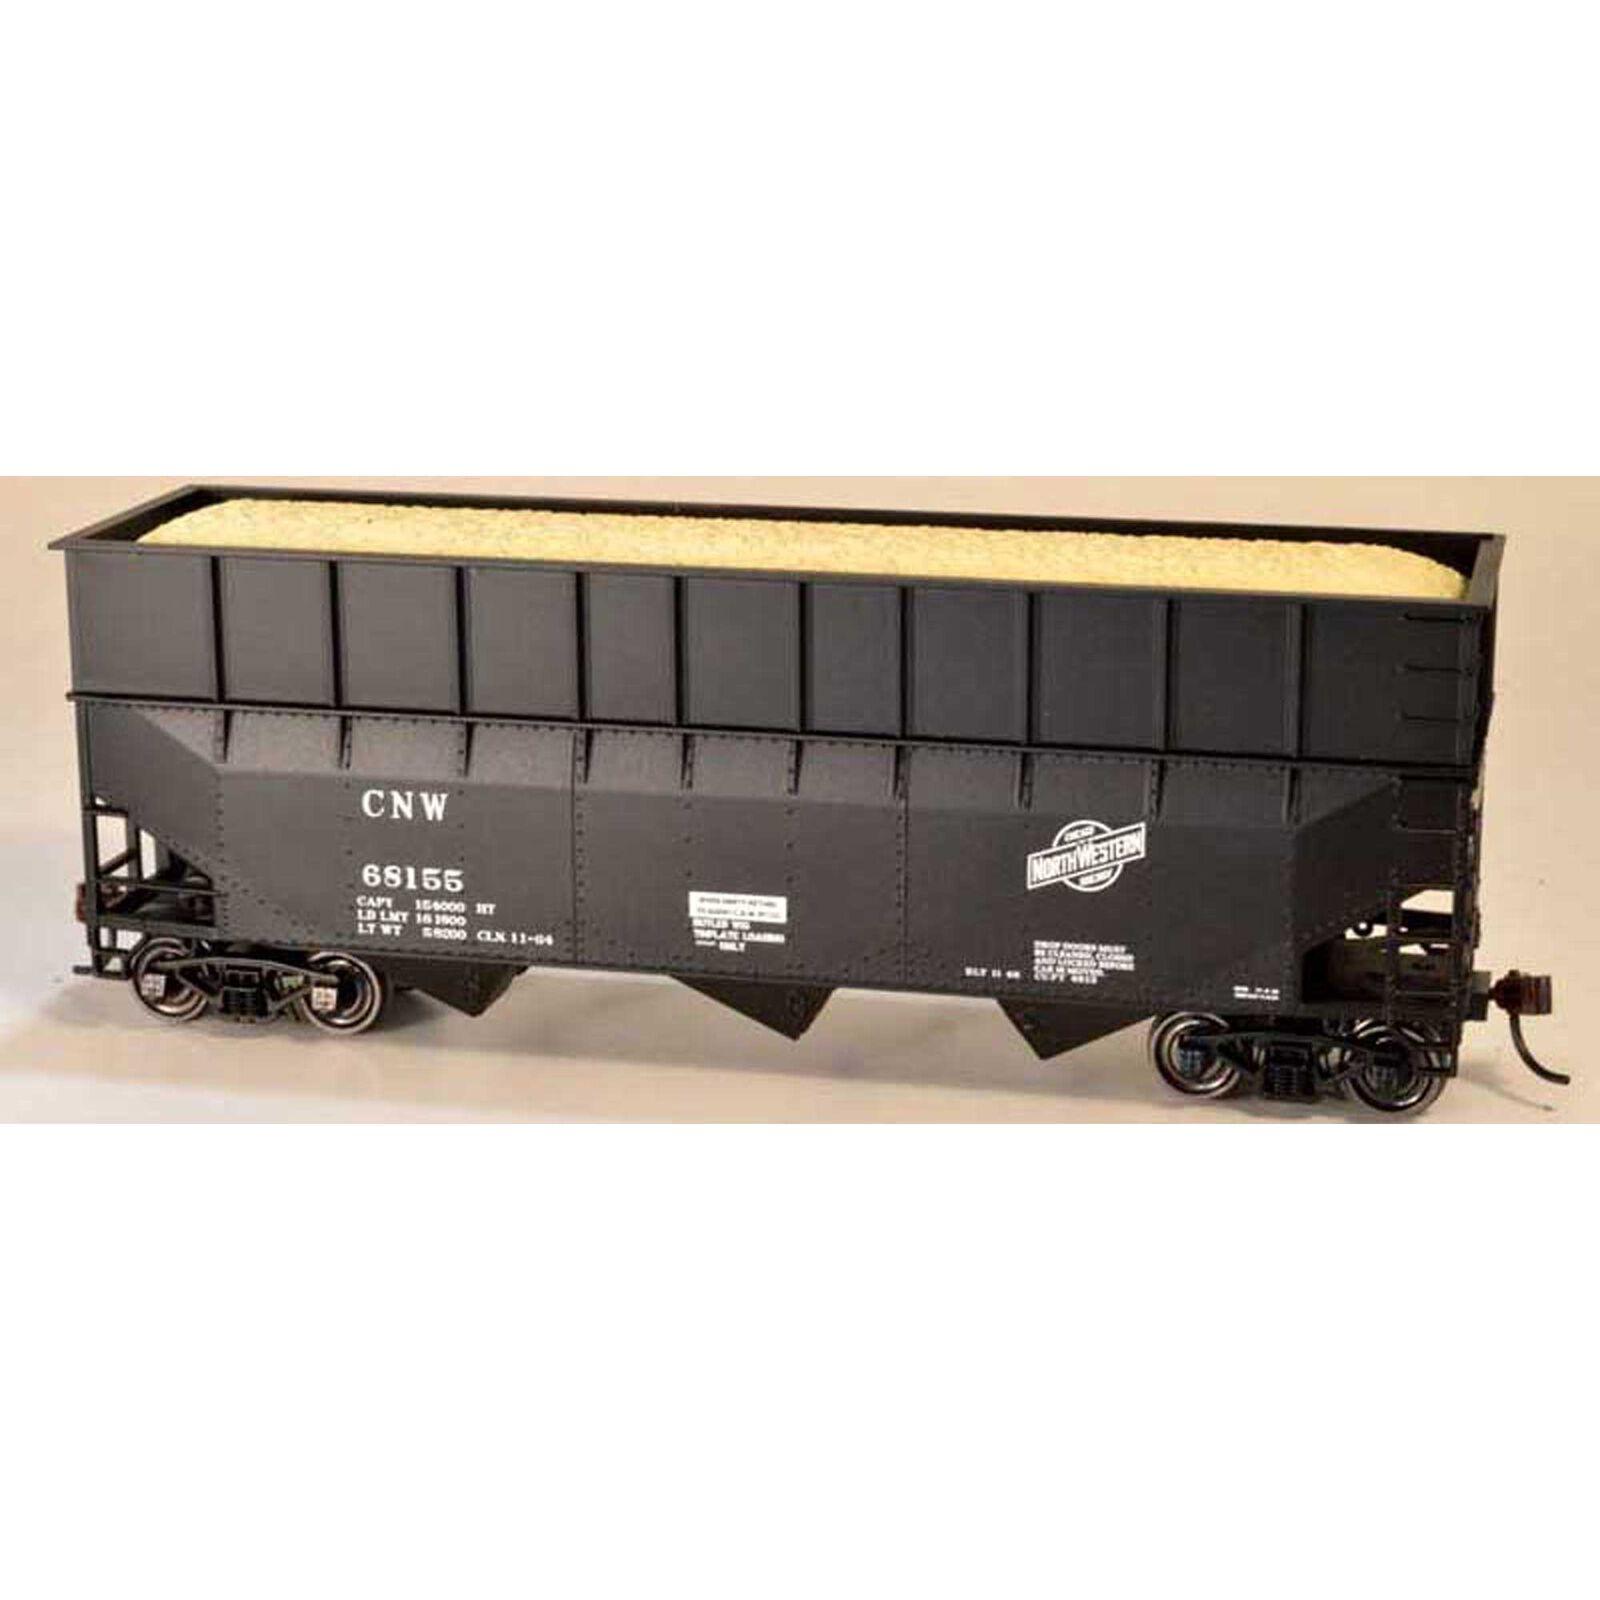 70 Ton Wood Chipper Car Ready to Run HO C&NW 68161